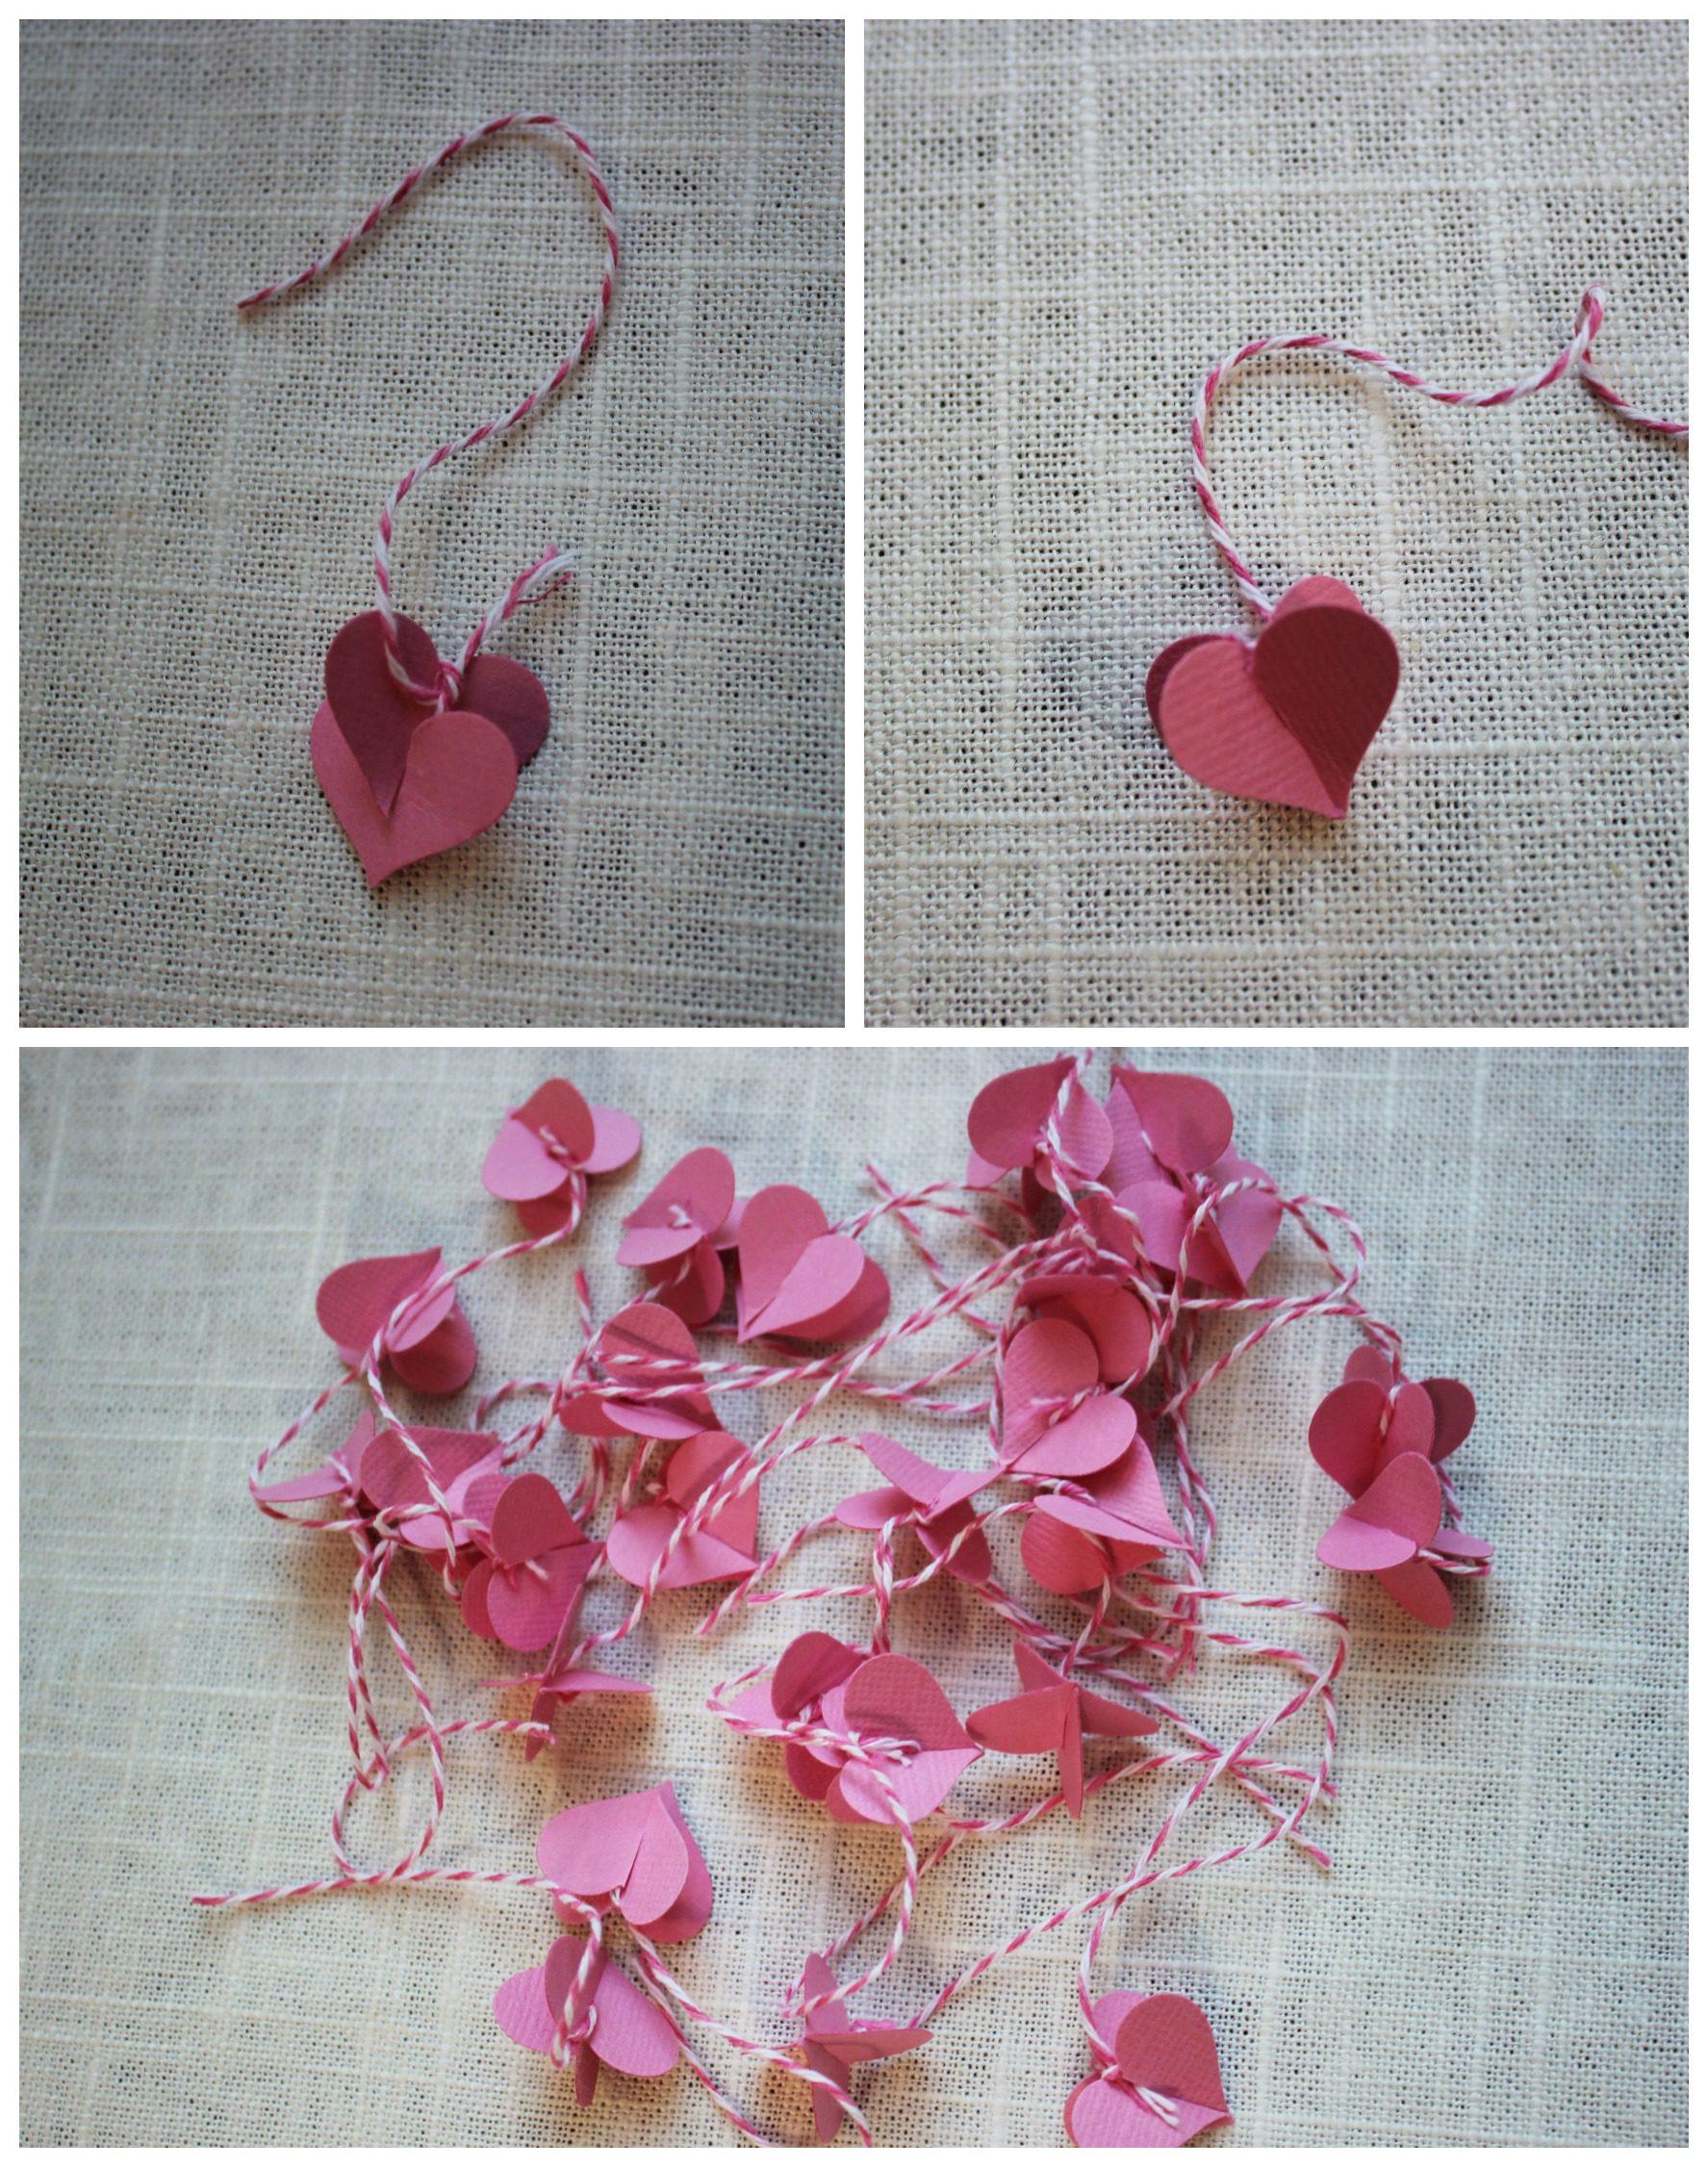 VALENTINE'S HEART TREE DIY